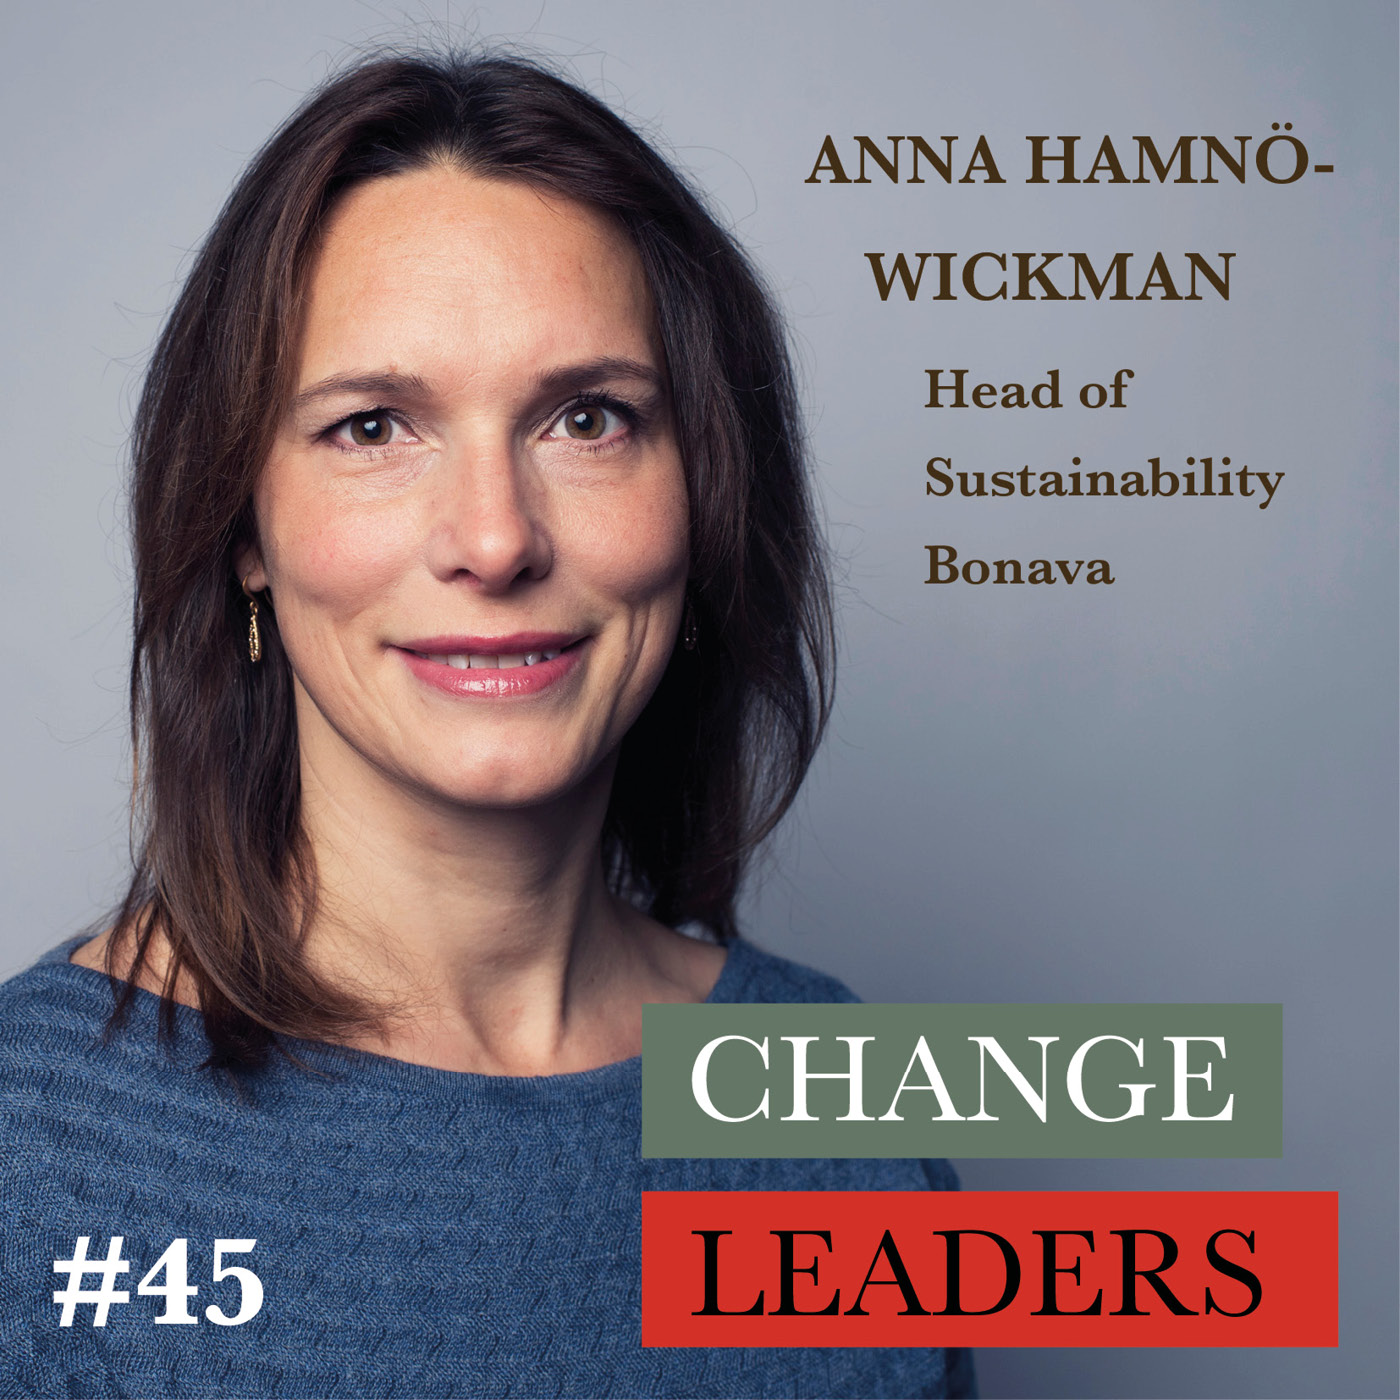 #45 Anna Hamnö Wickman, Head of Sustainability Bonava - What makes a happy home?